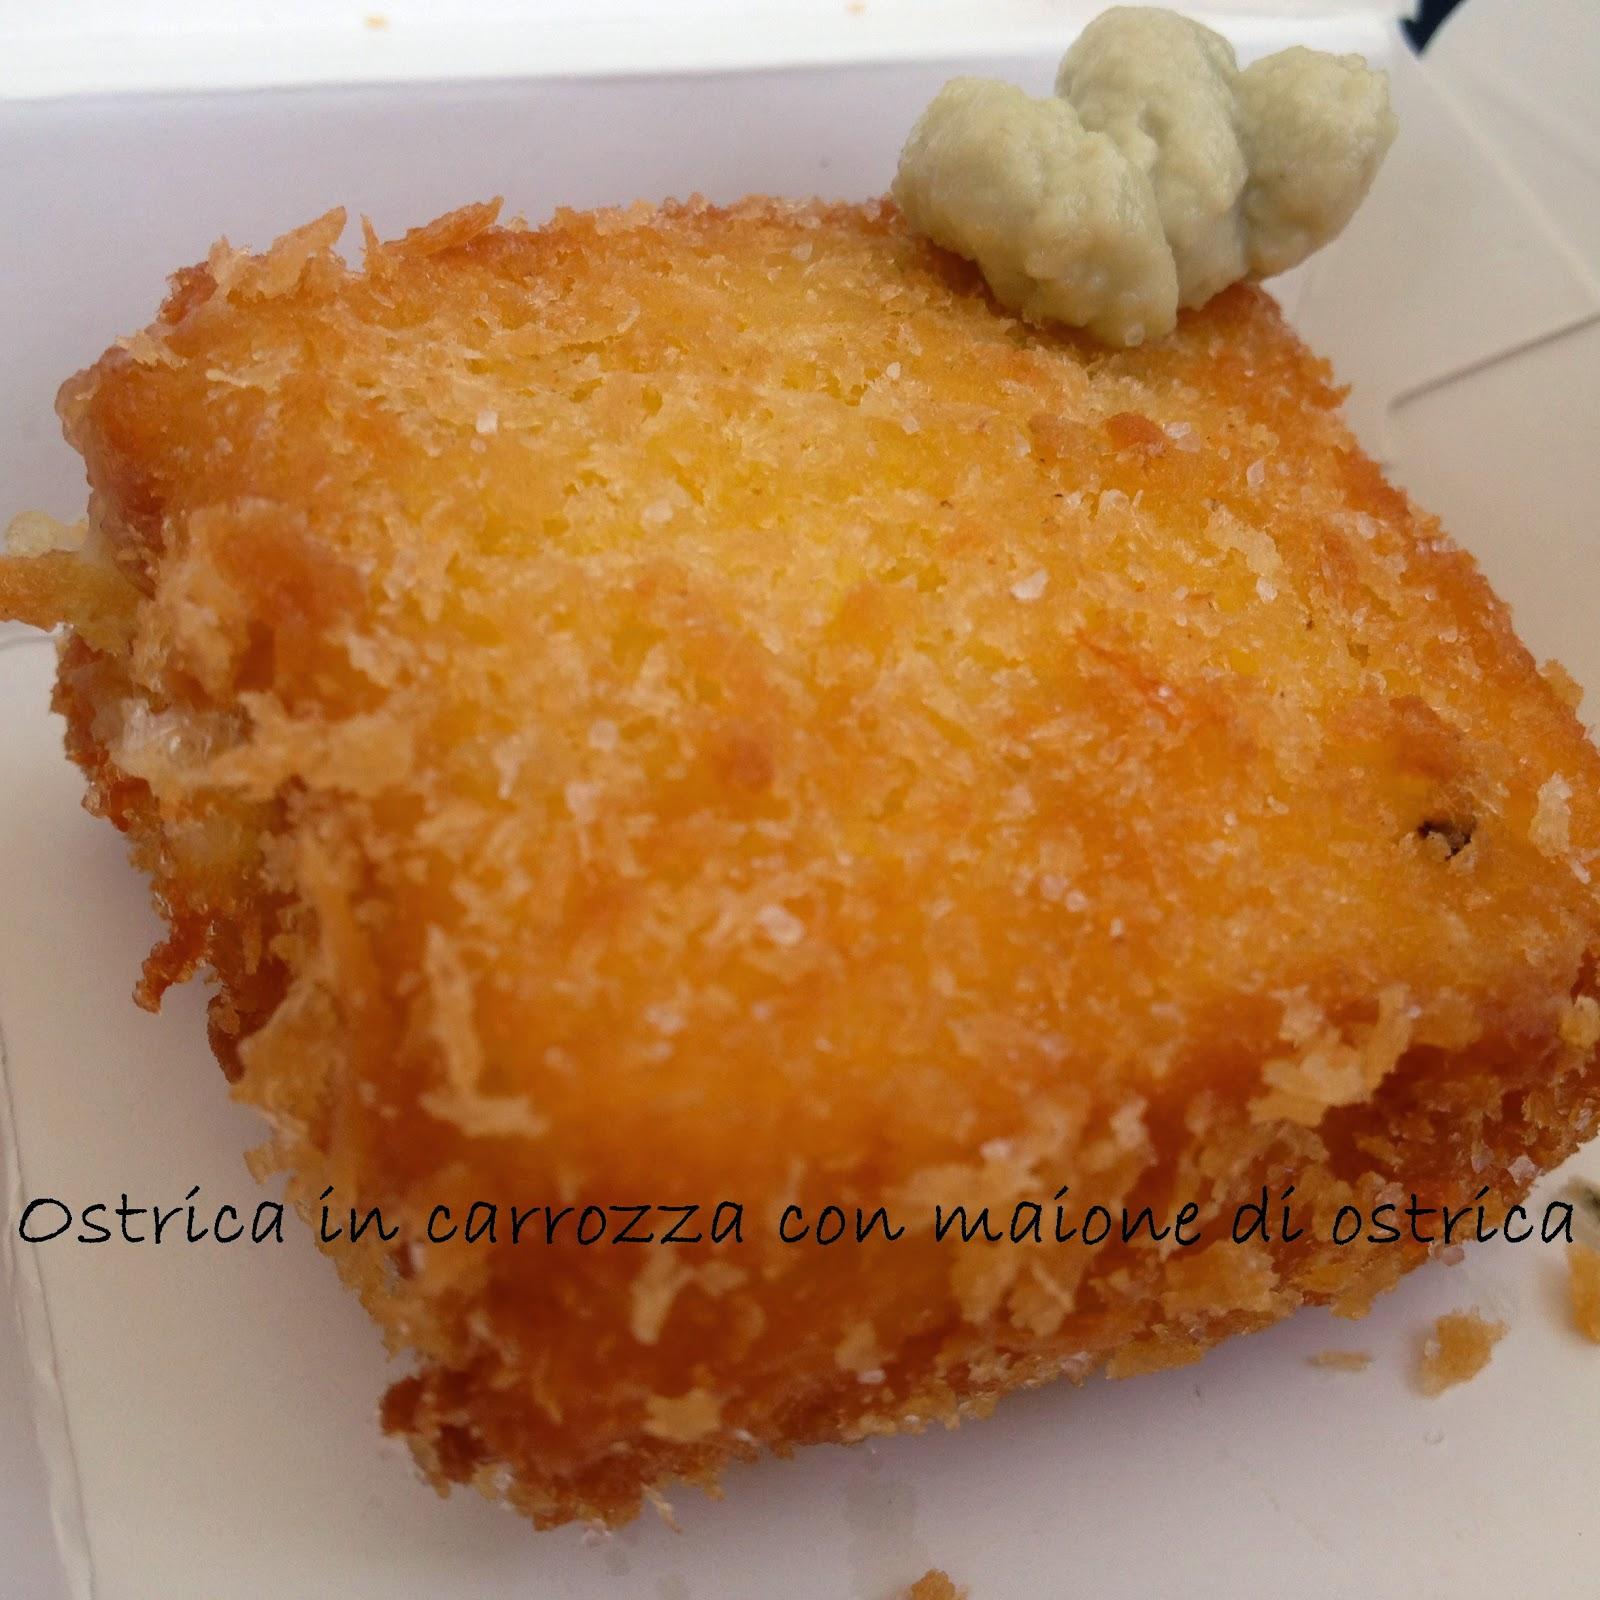 ostrica in carrozza con maione di ostrica taste of roma 2014